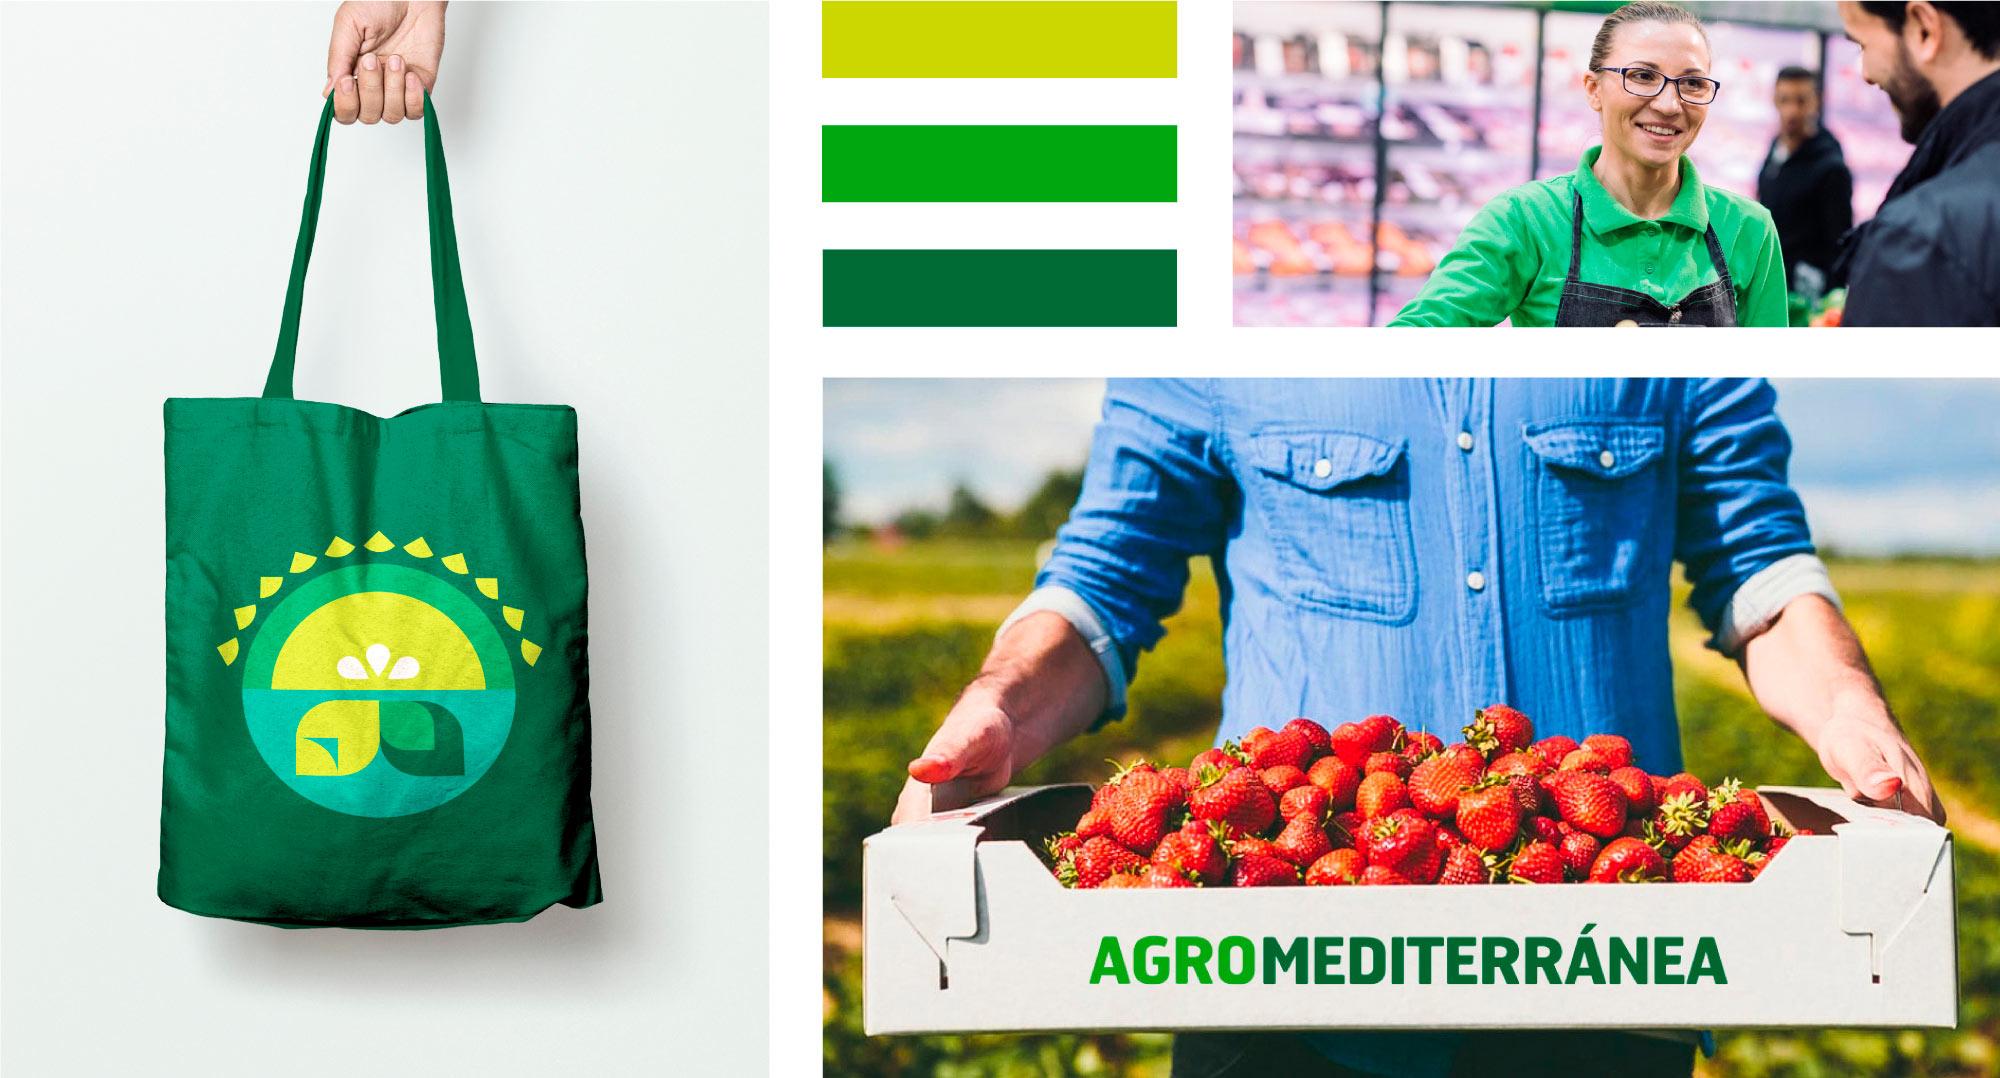 Agromediterranea-branding-01